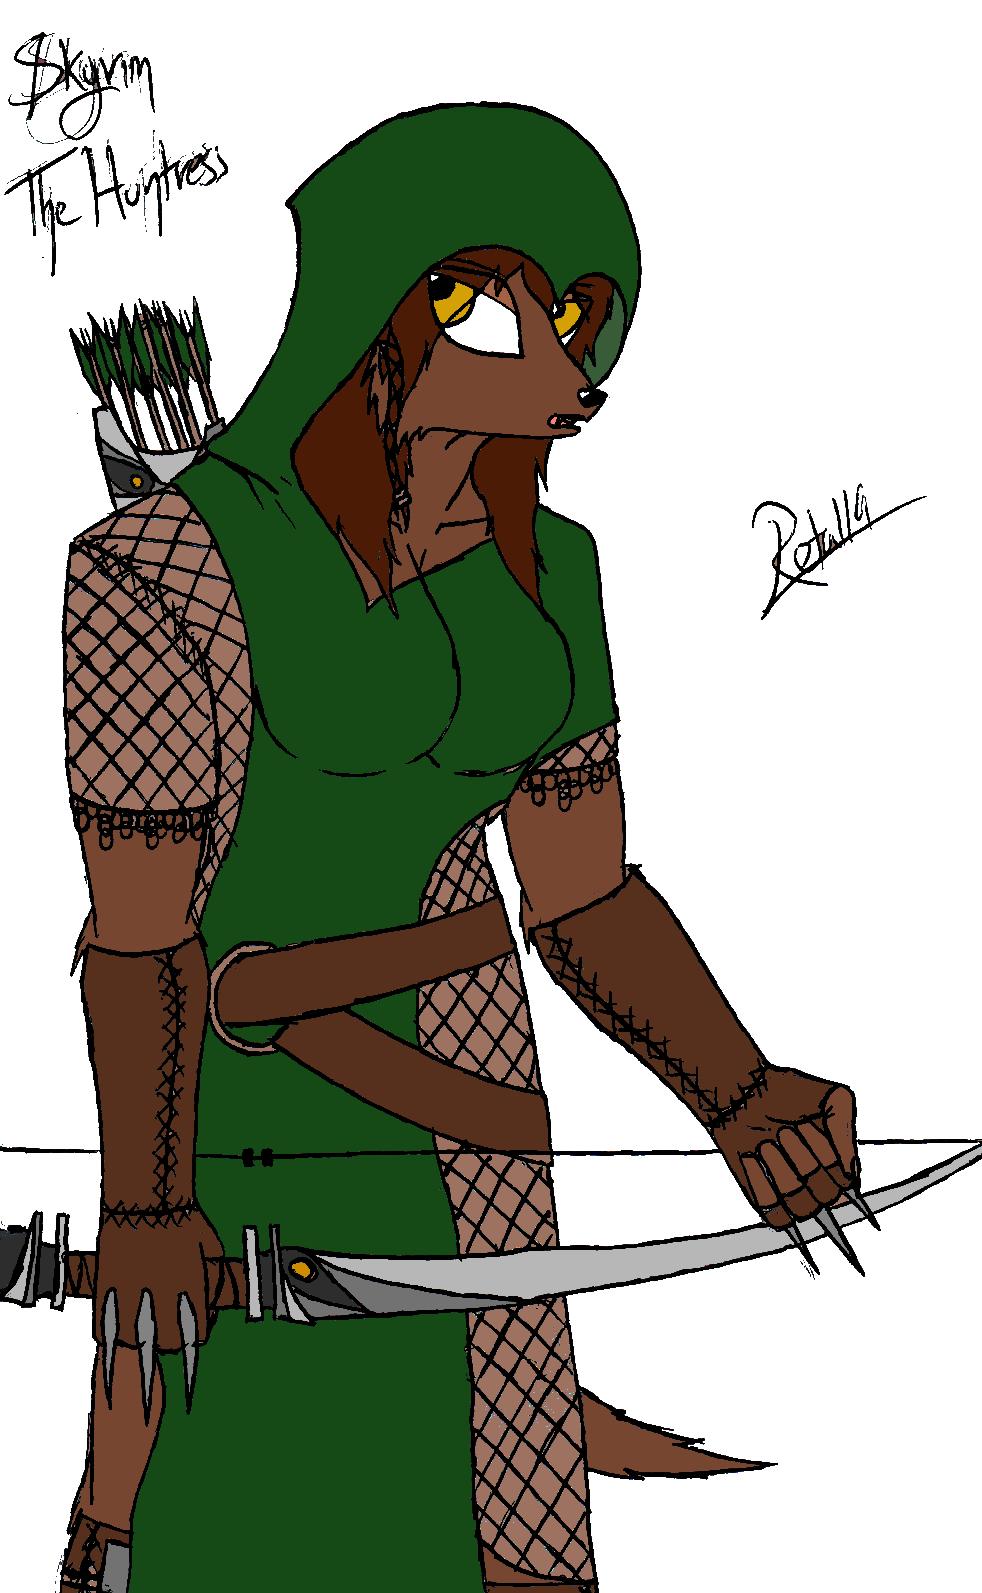 Skyrim - The Huntress by Retal19